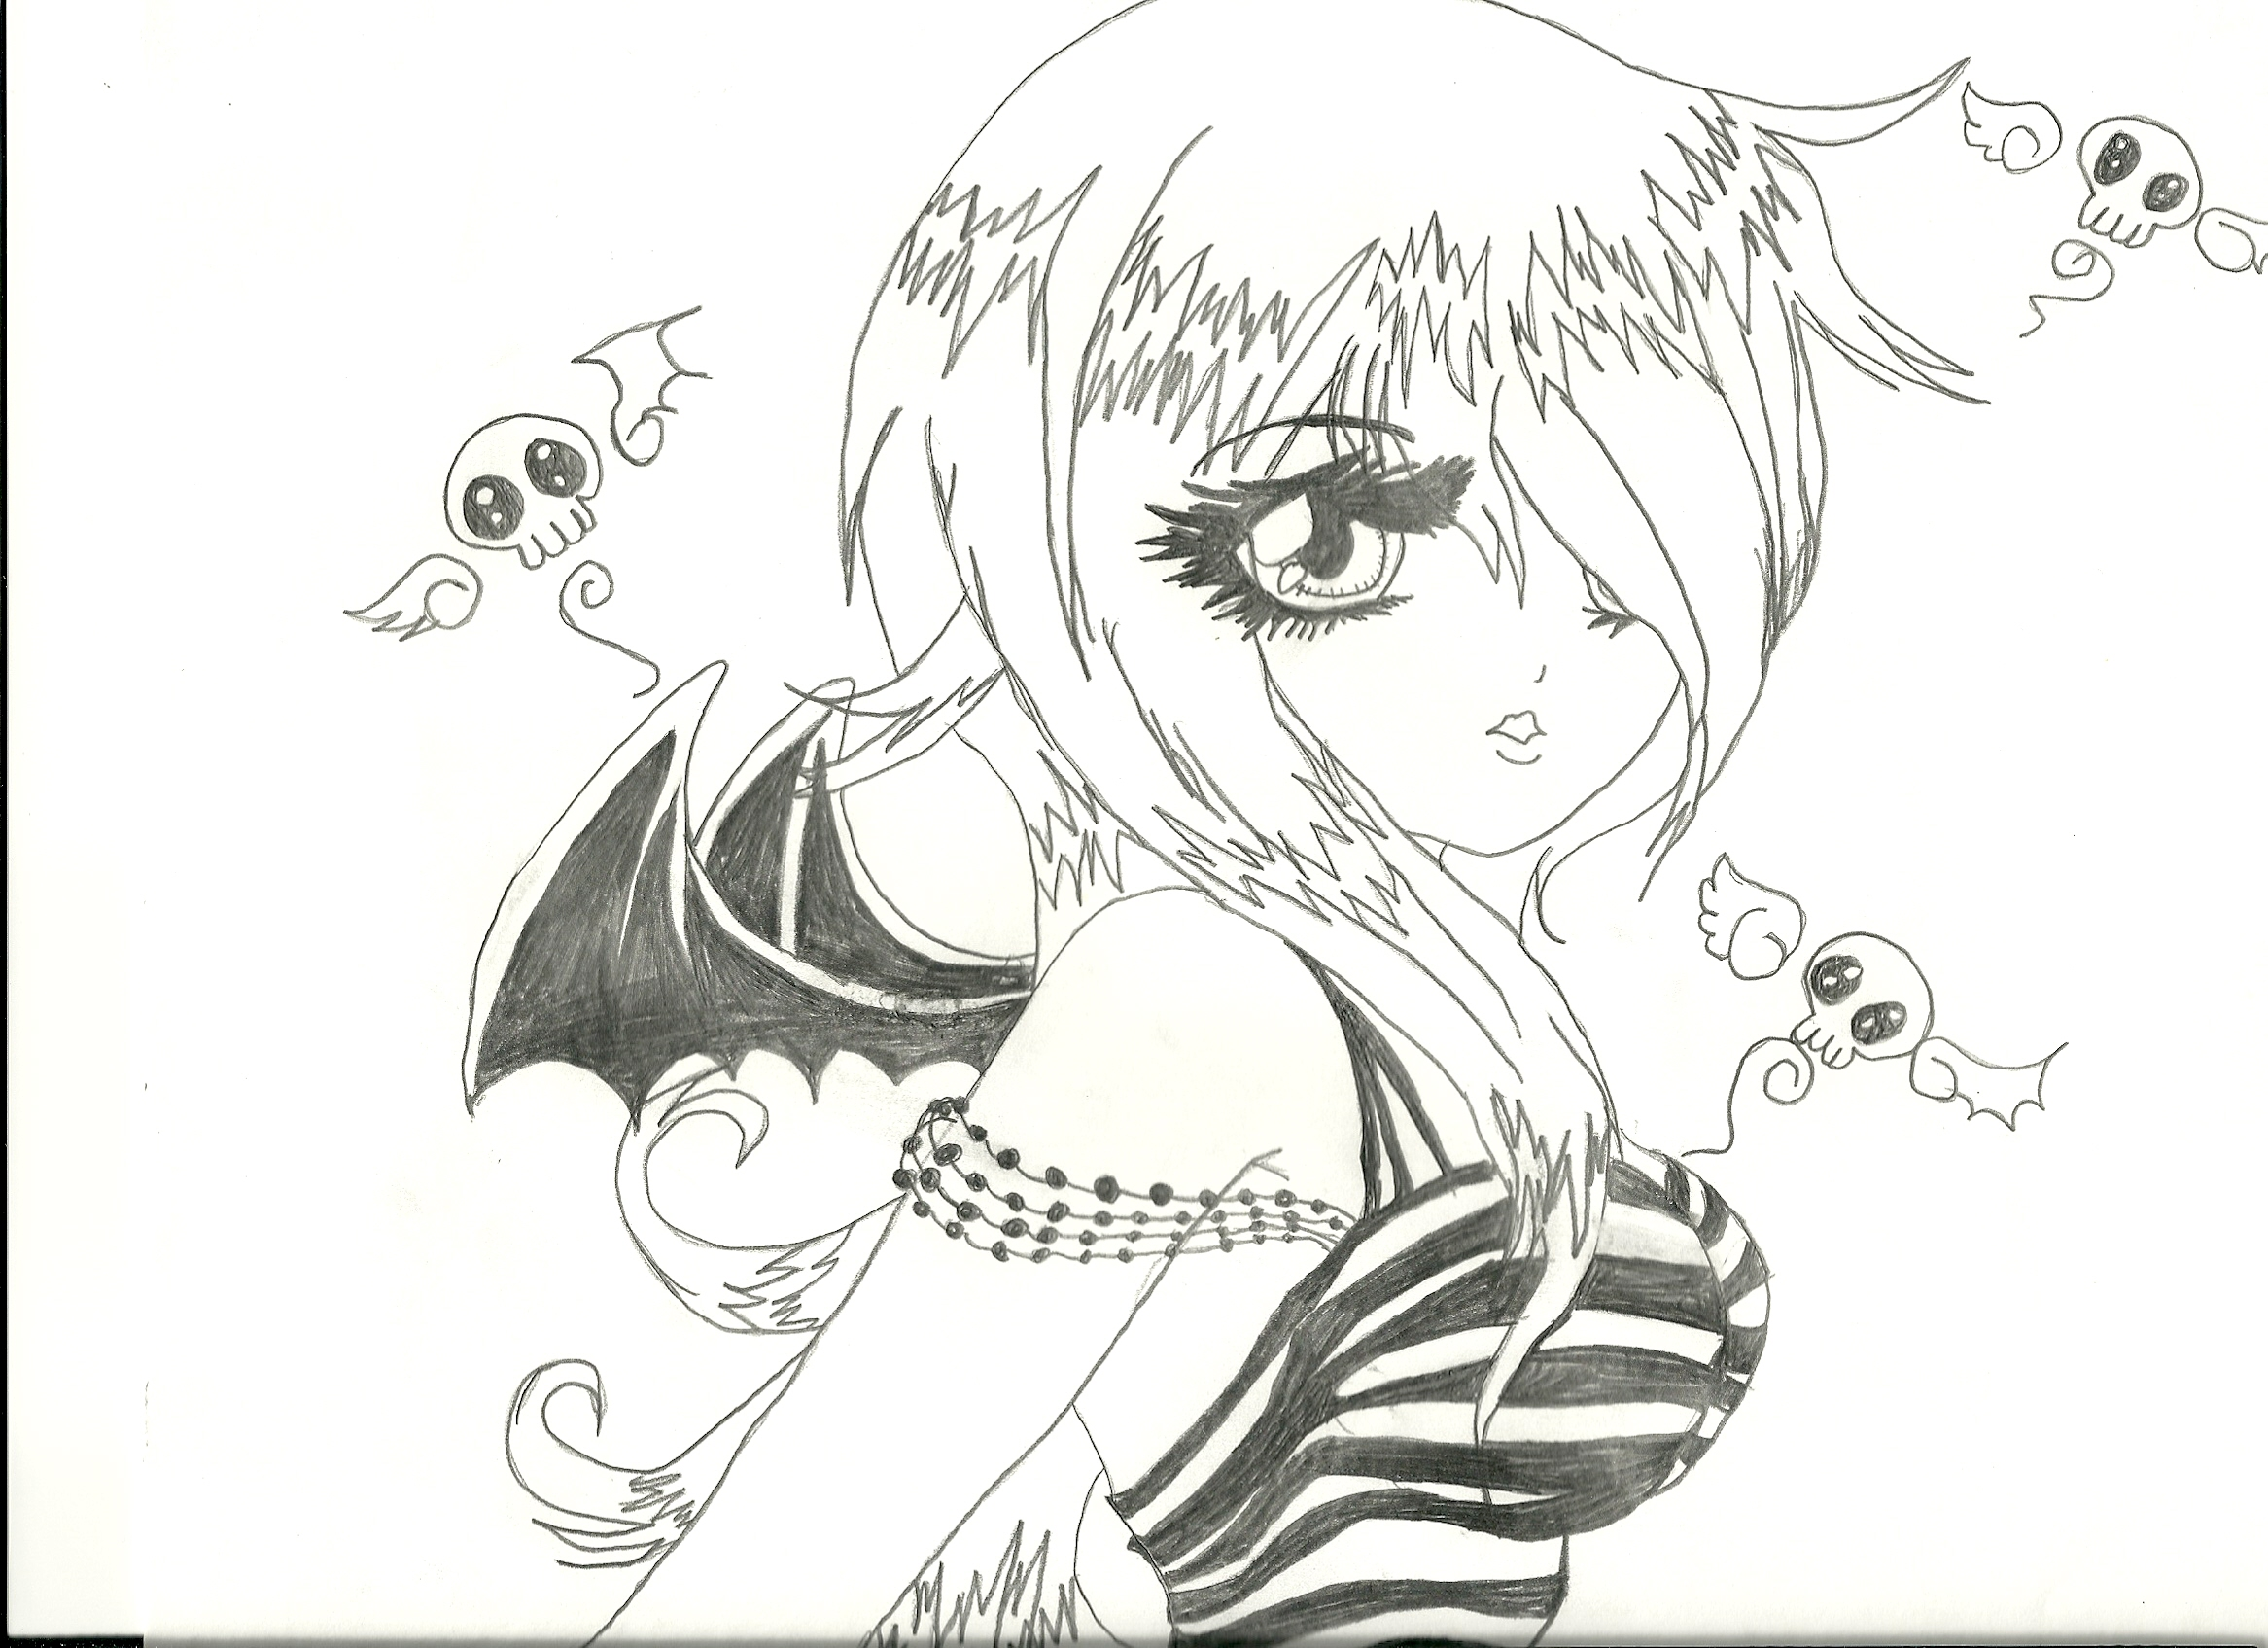 Drawn ninja demon Girl How Drawing Guide Draw